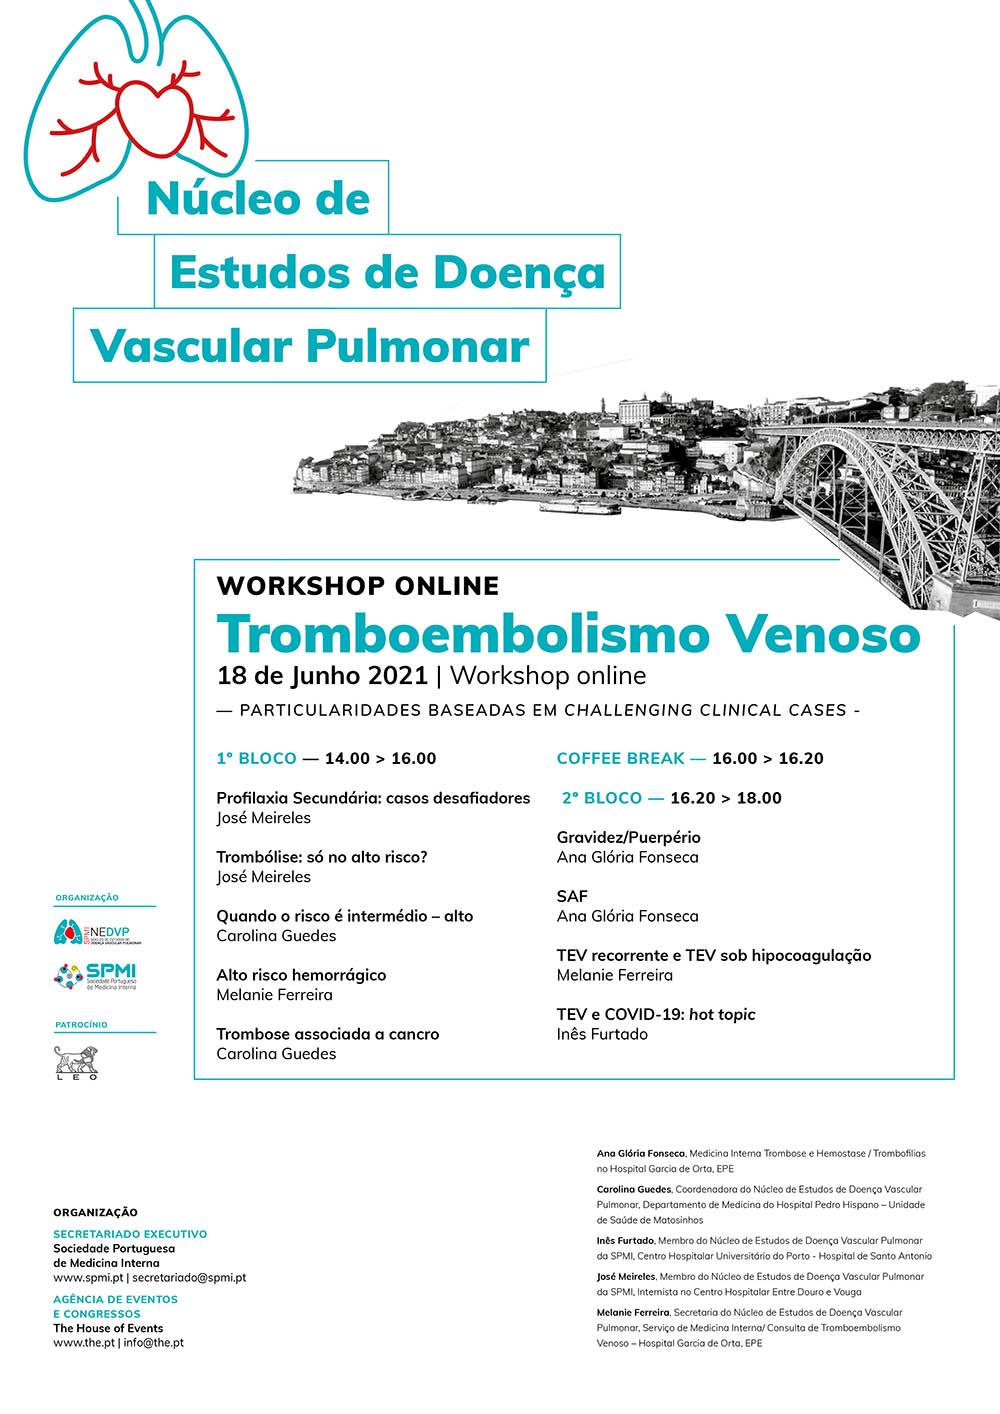 Workshop Online de Tromboembolismo Venoso,